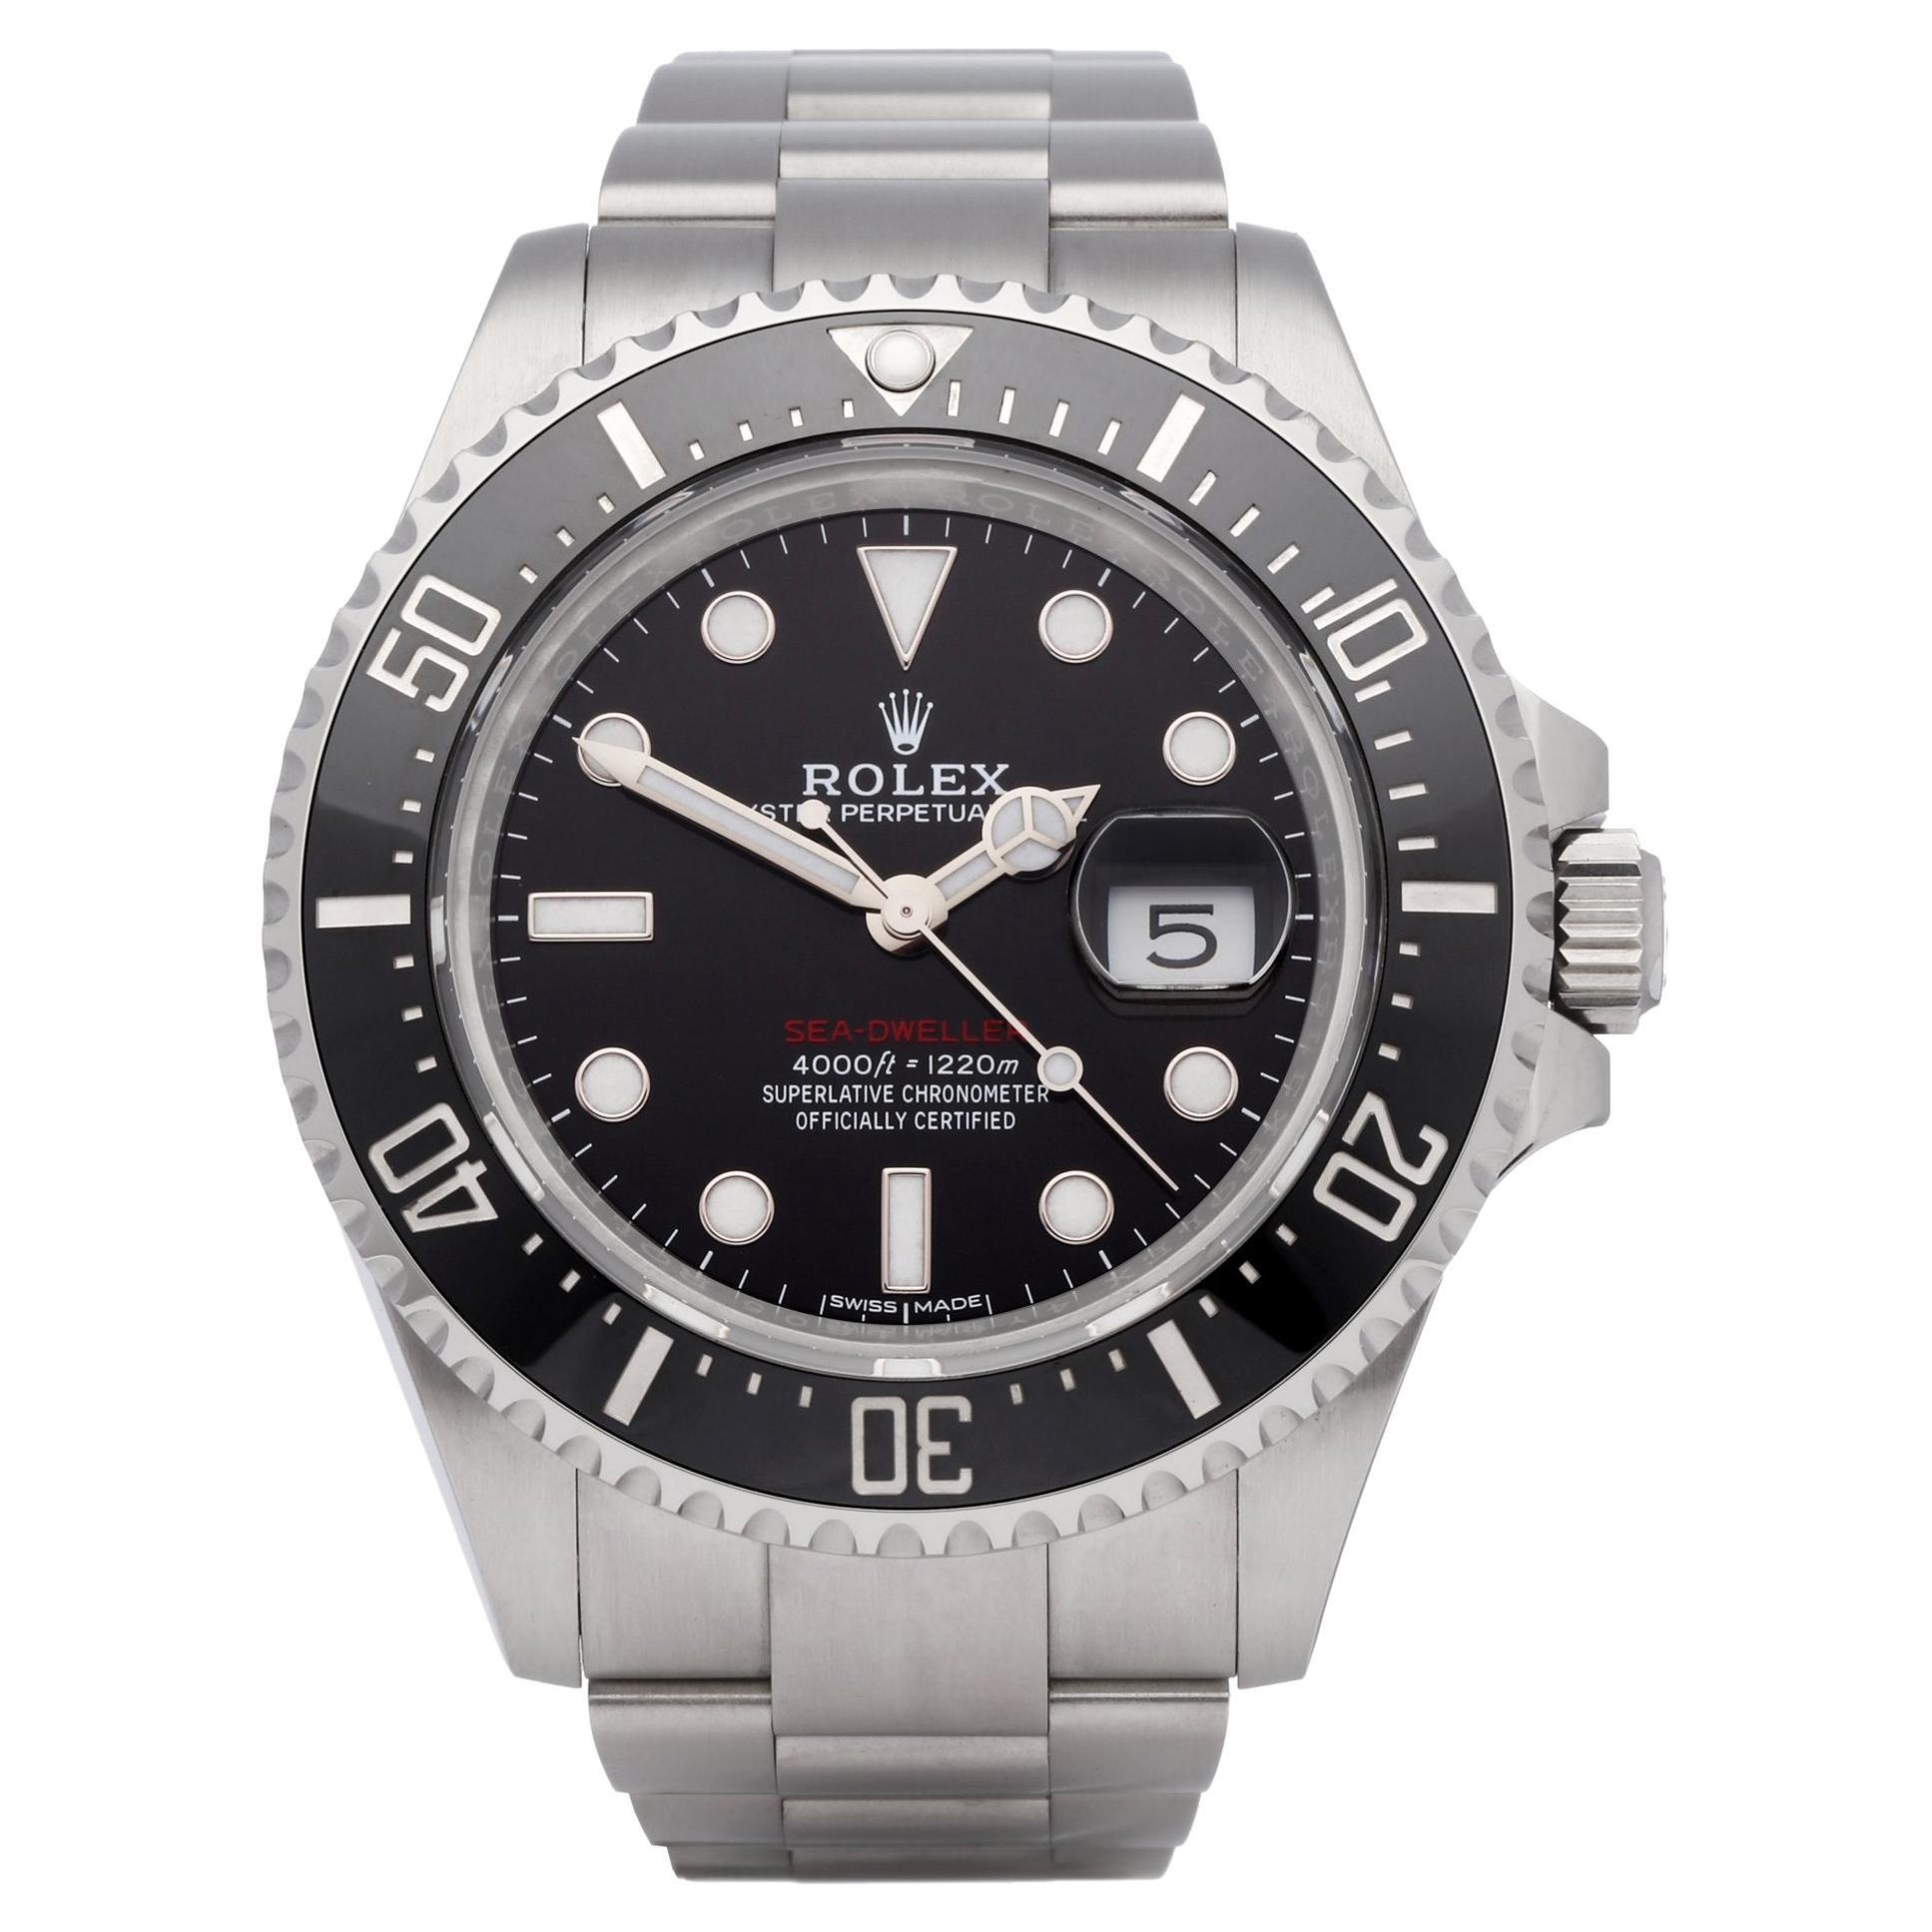 Rolex Sea-Dweller 0 126600 Men's Stainless Steel 0 Watch